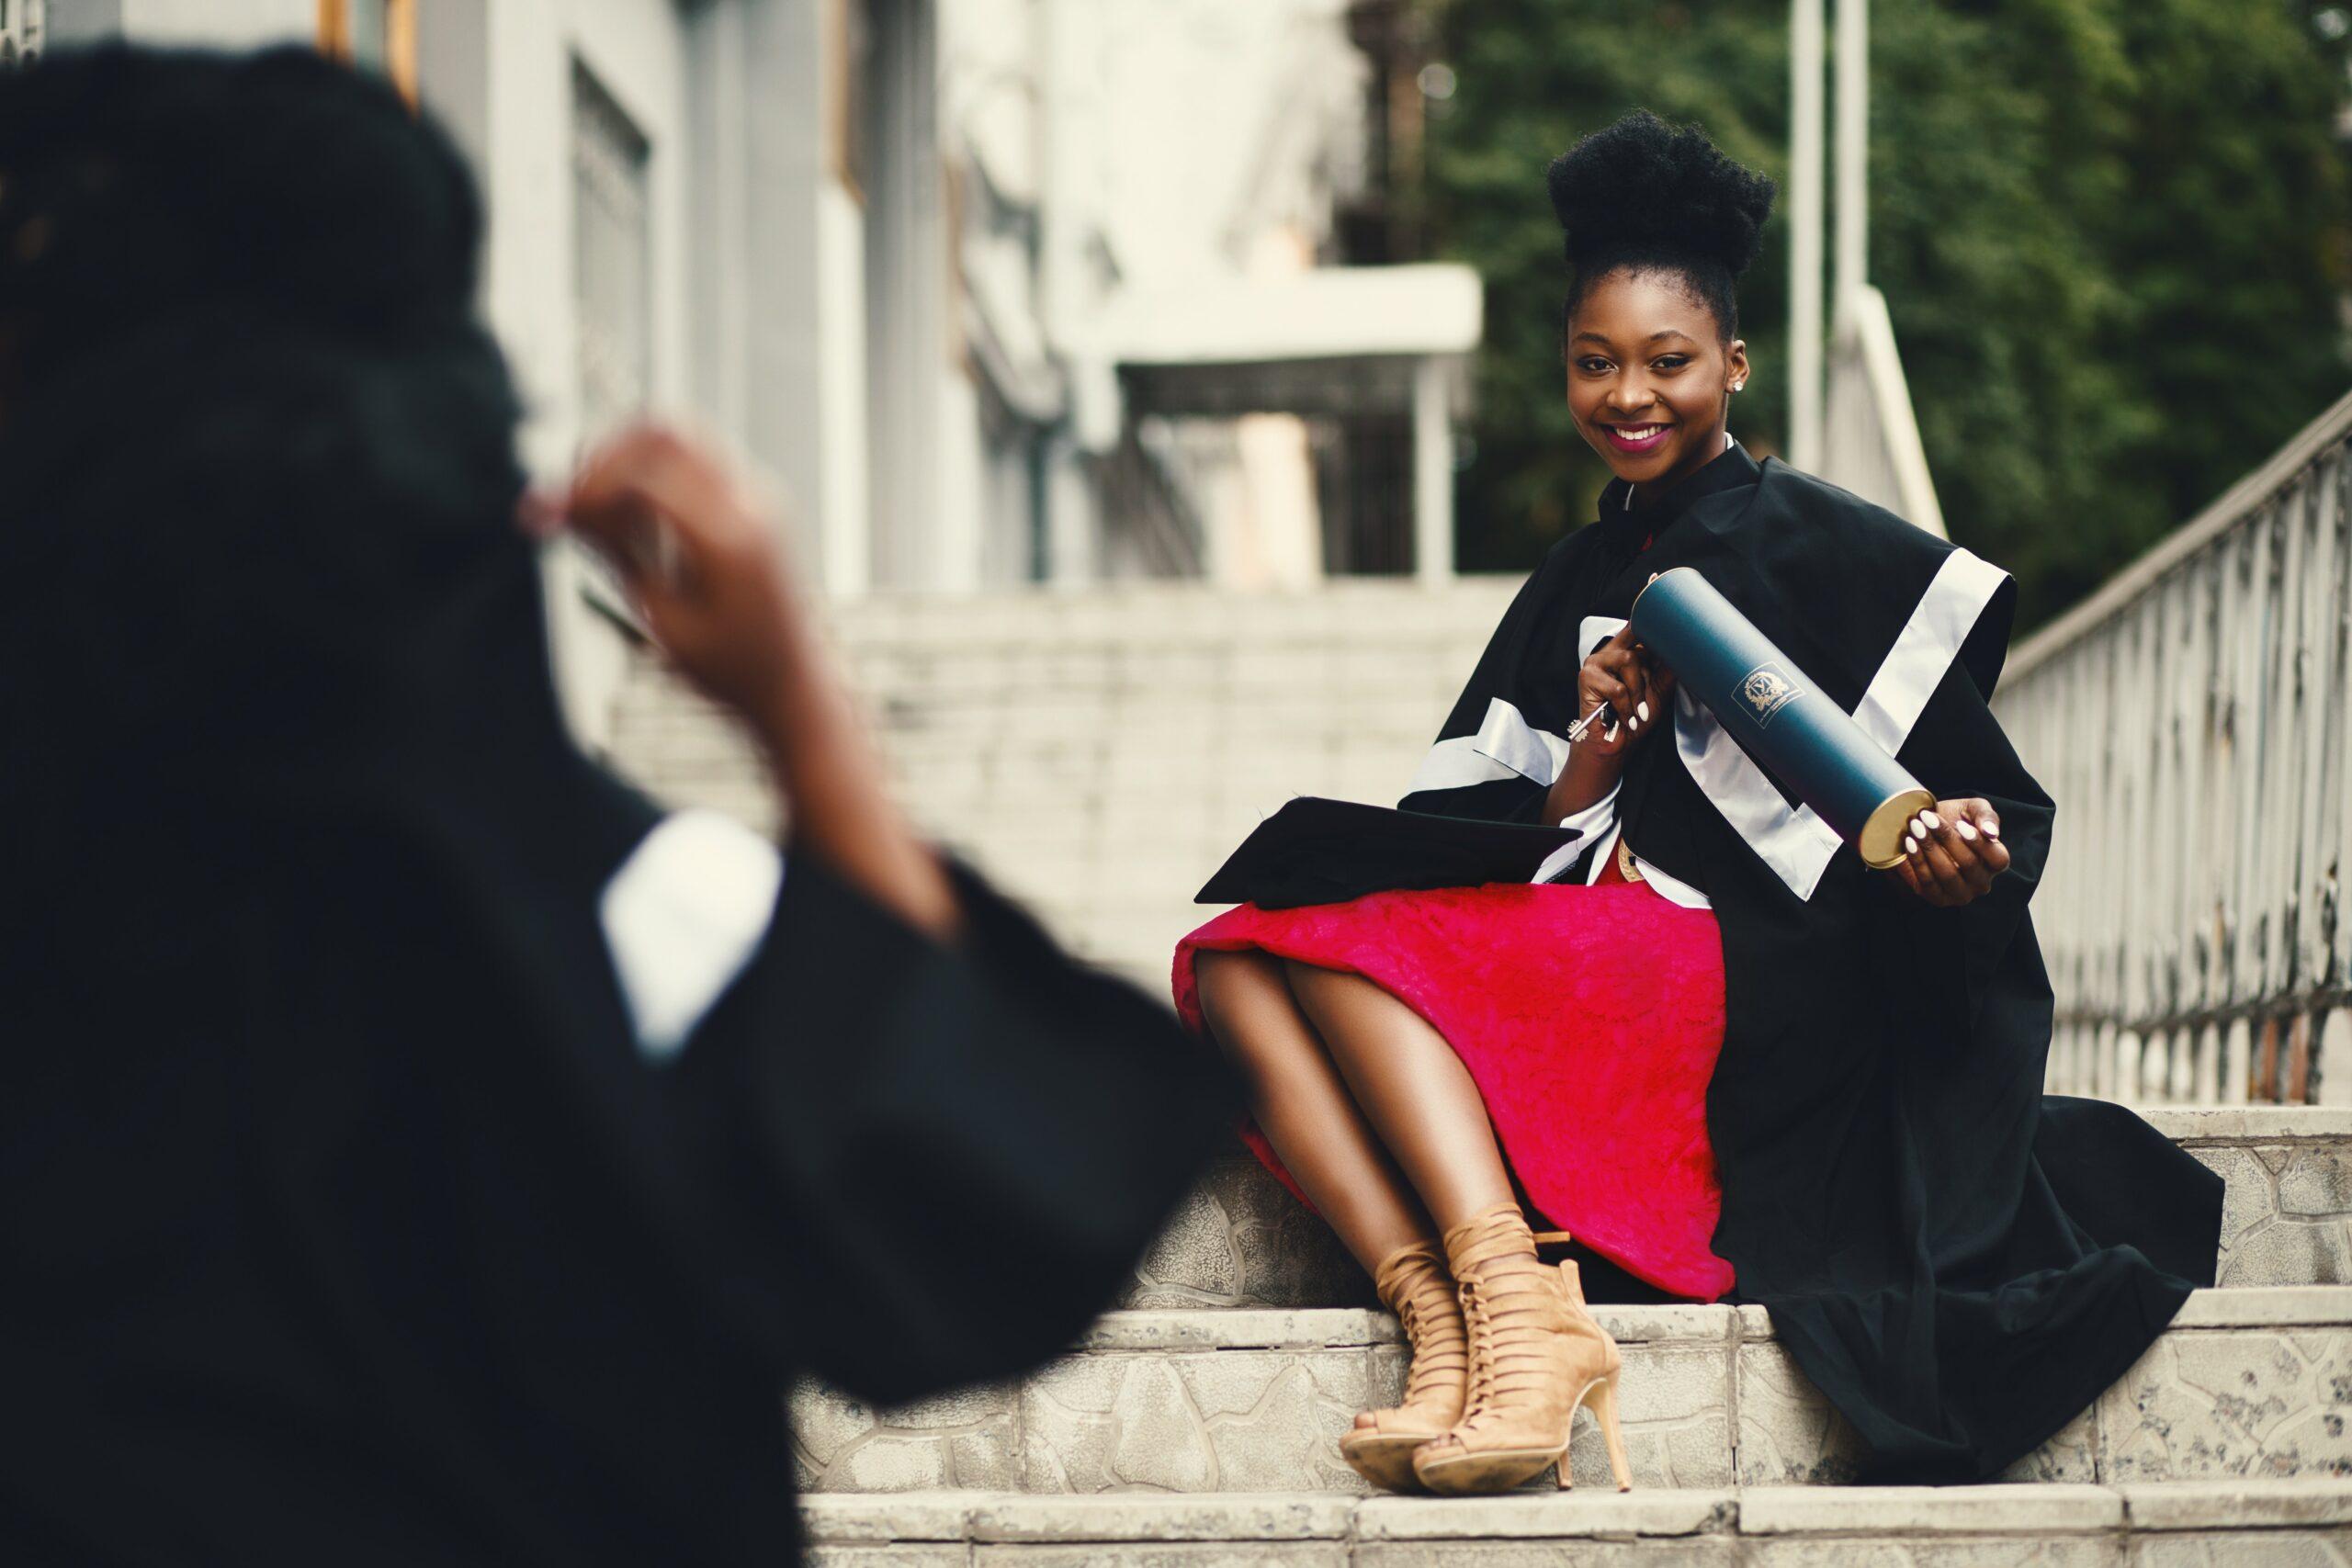 65 Student Loan Statistics: 2020/2021 Data, Trends & Predictions